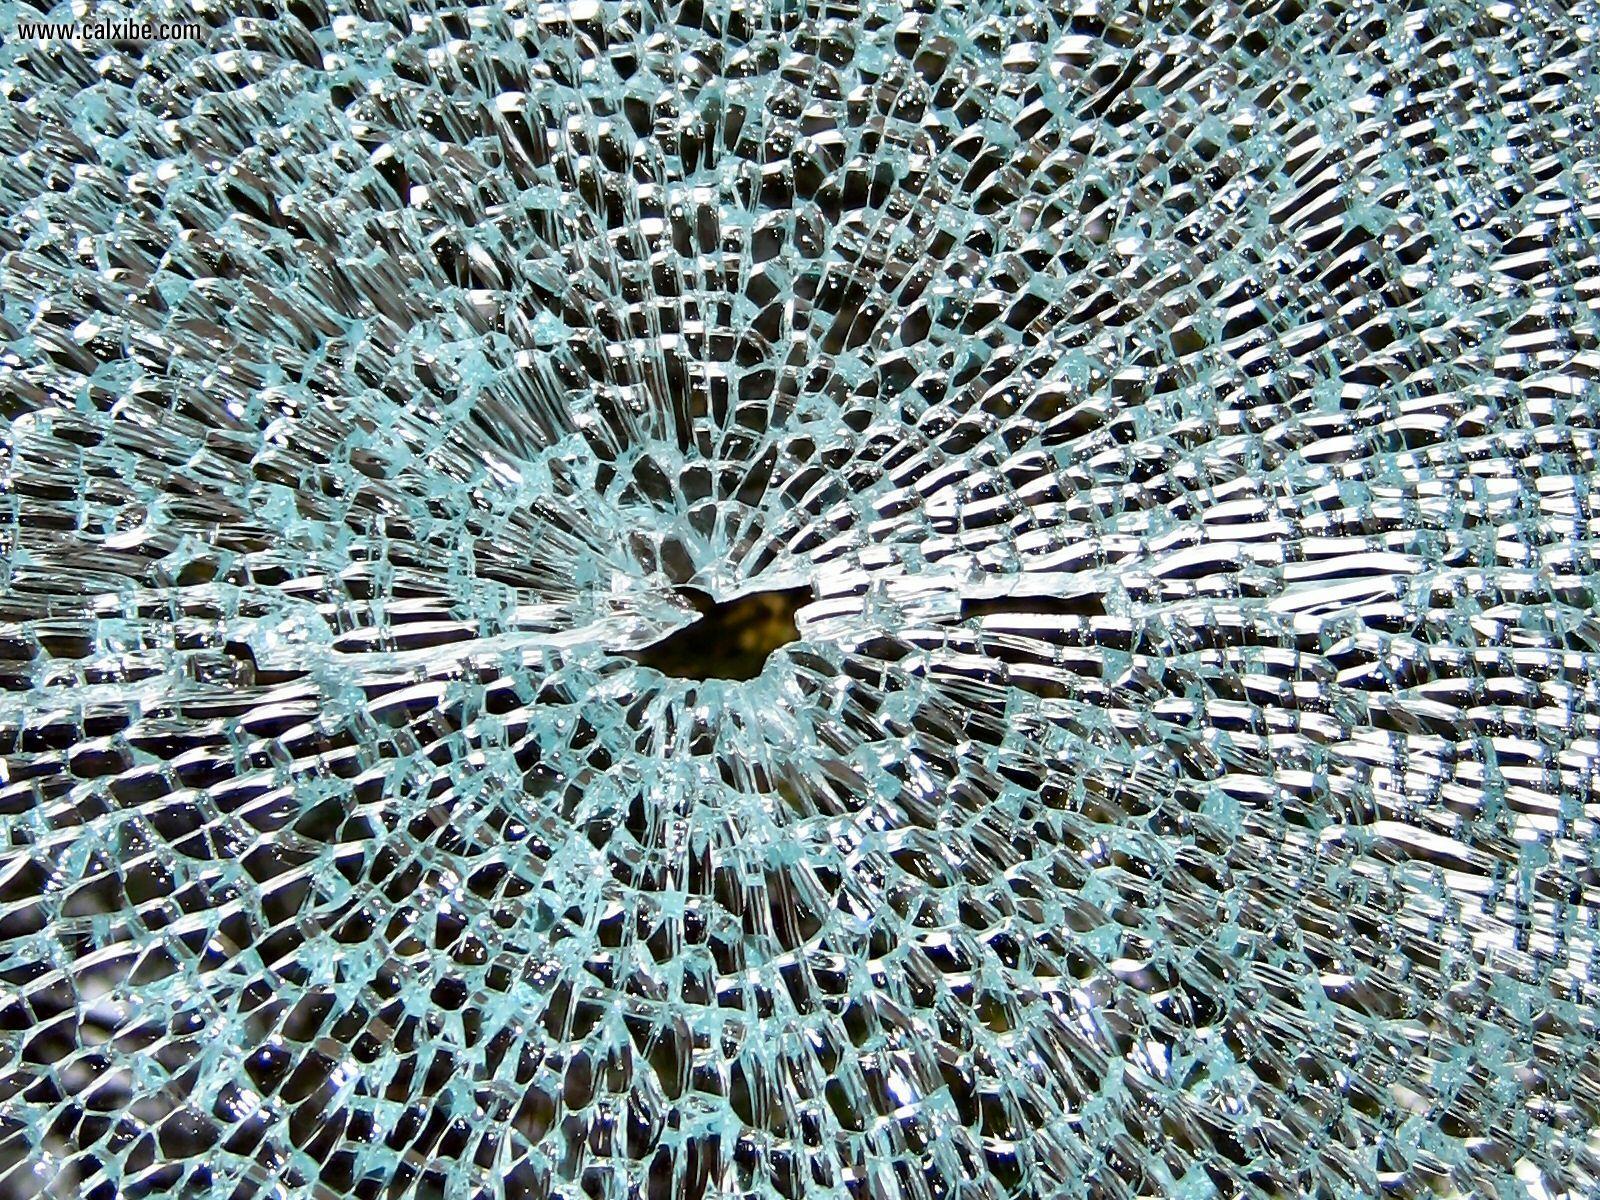 tags shattered glass 7 pics glass 12 pics 1600x1200